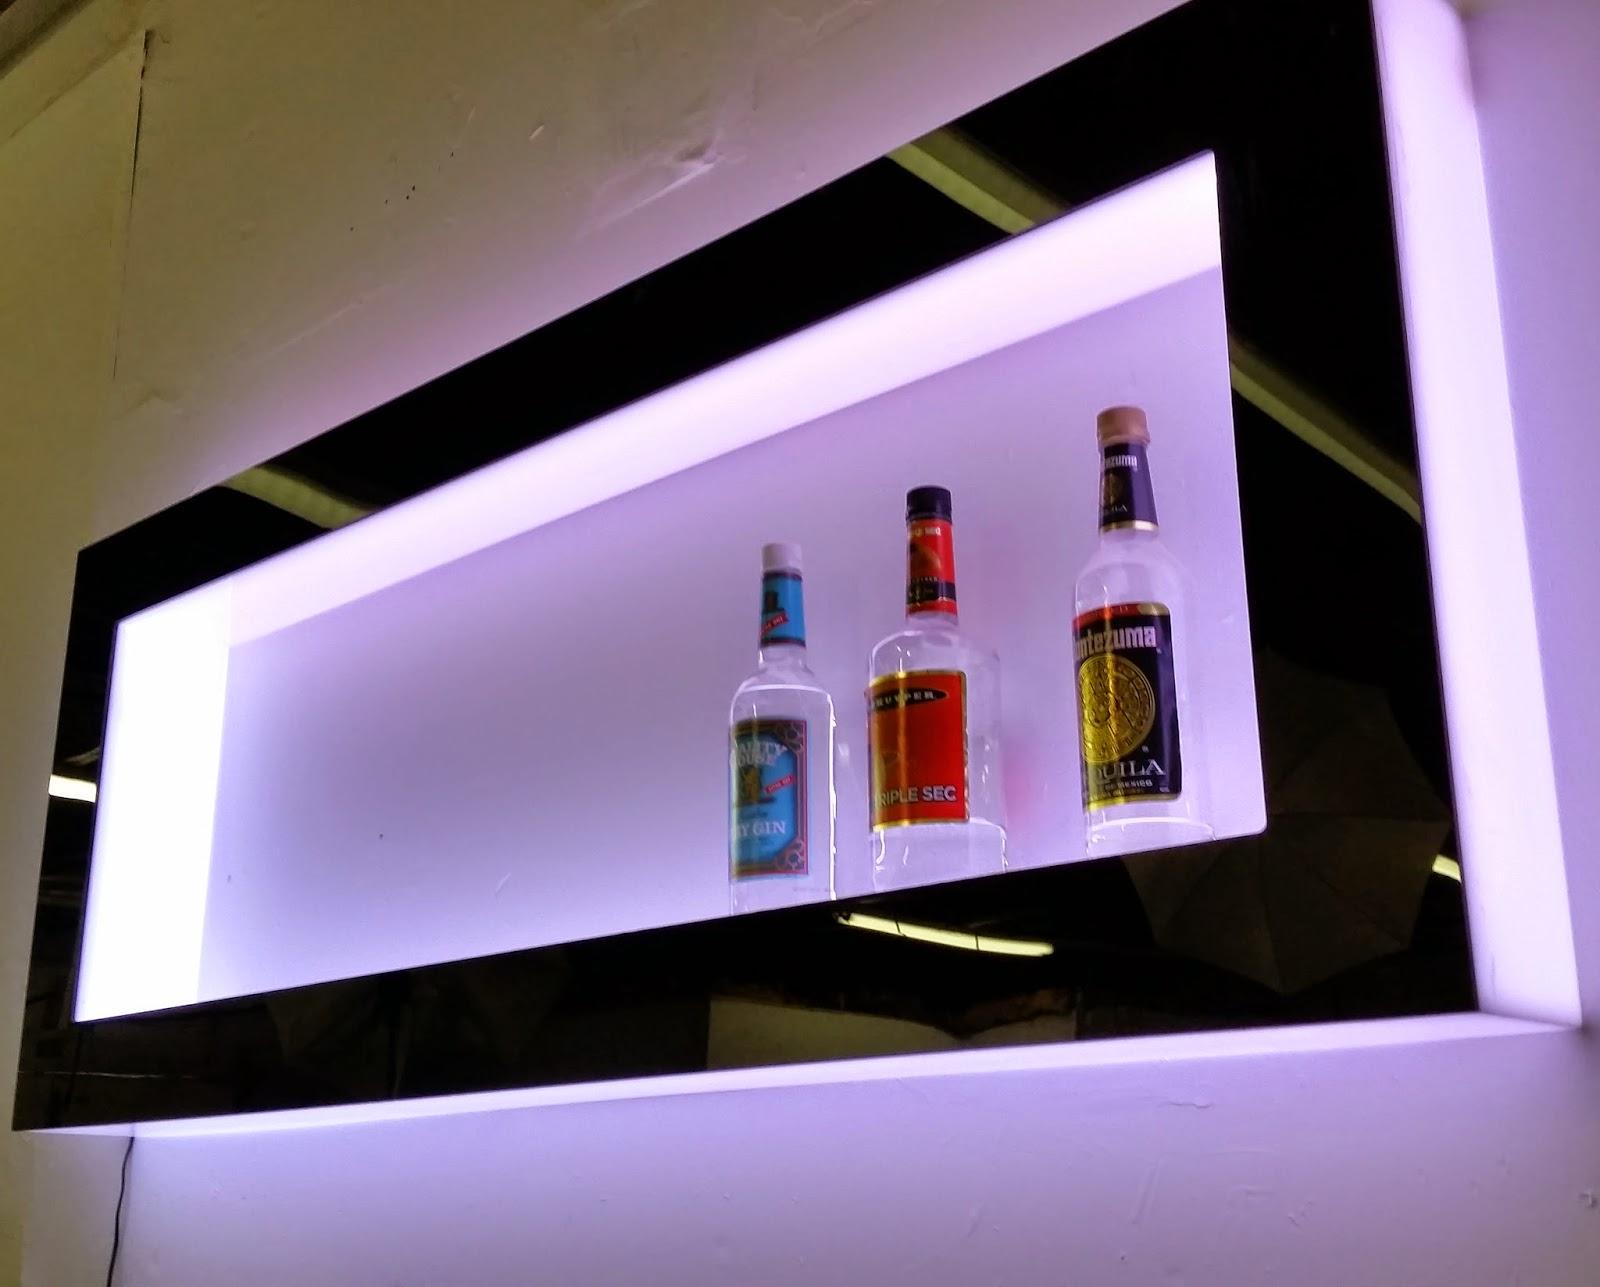 barchefs glowing furniture and event equipment blog. Black Bedroom Furniture Sets. Home Design Ideas